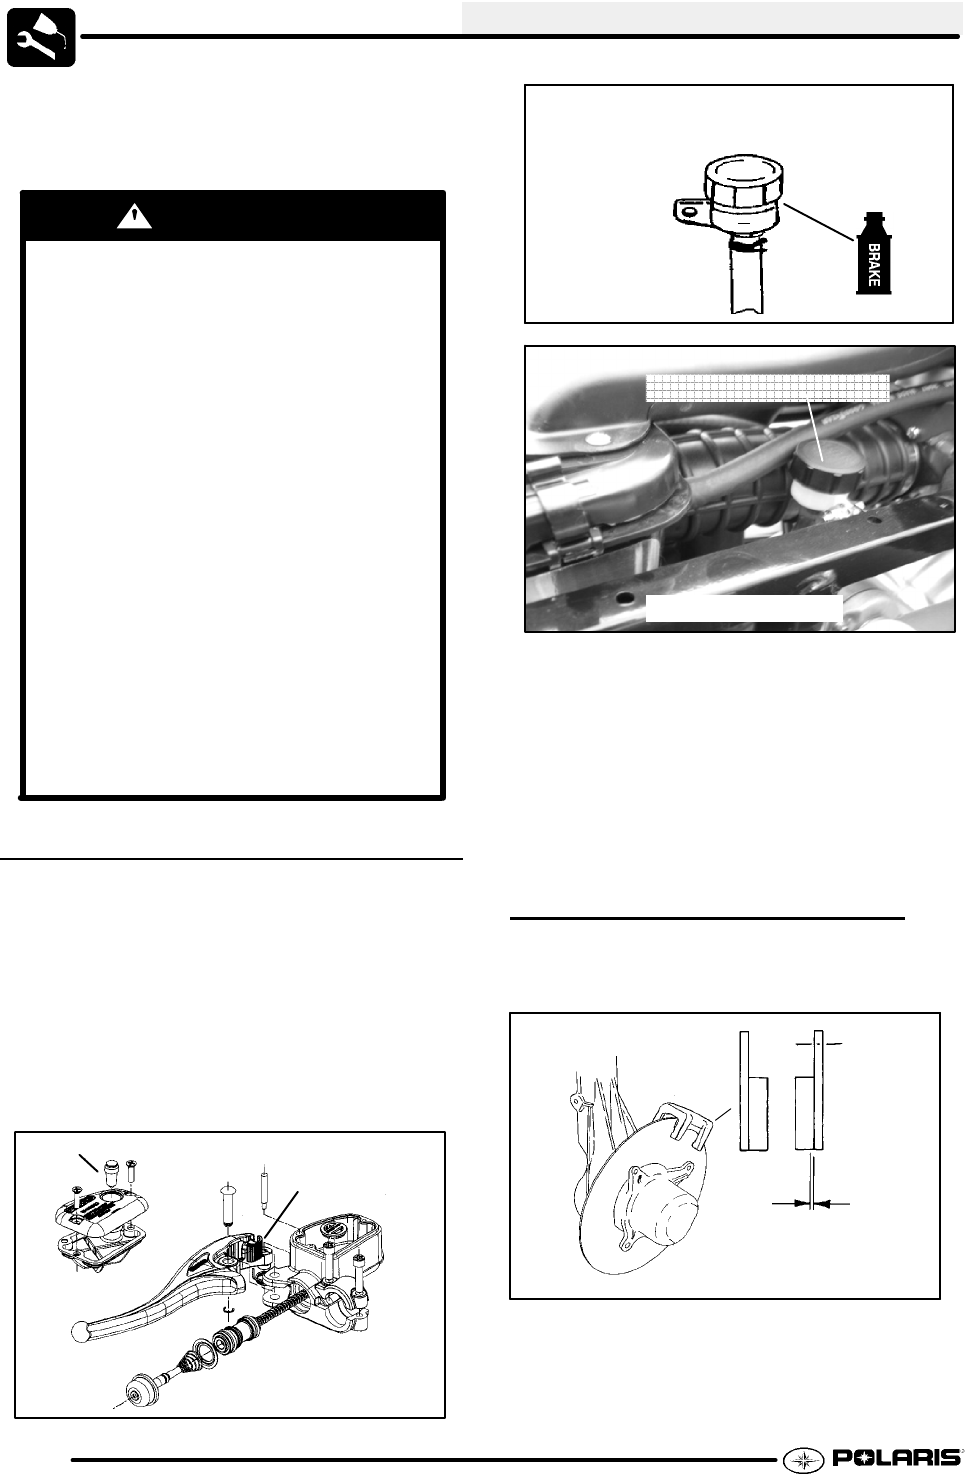 2005 Polaris Sportsman 700 EFI & 800 Service Manual